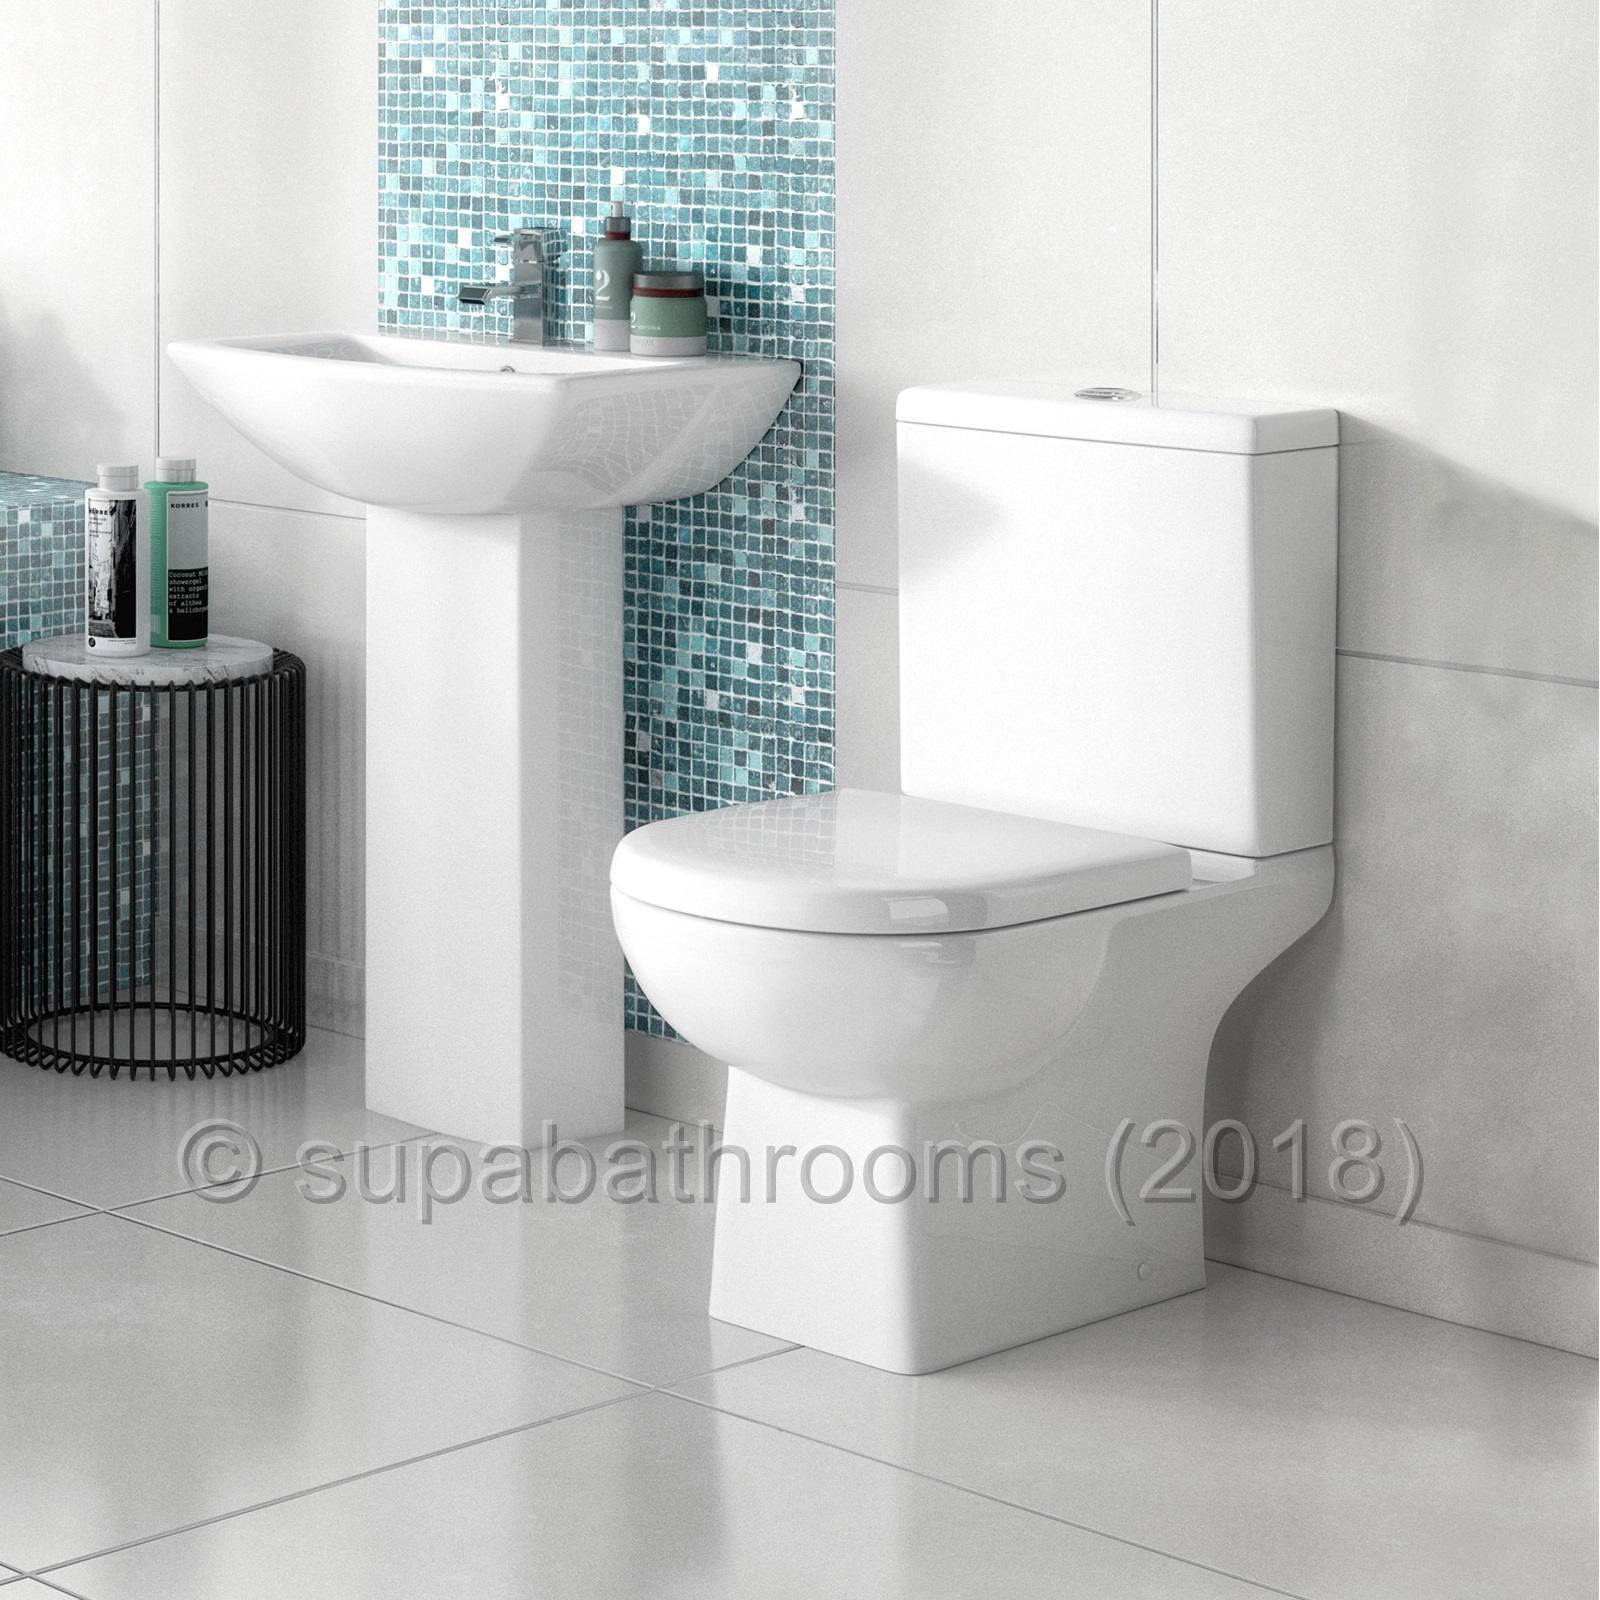 Asselby 4 Piece Bathroom Modern Suite Toilet WC Basin, Pedestal ...